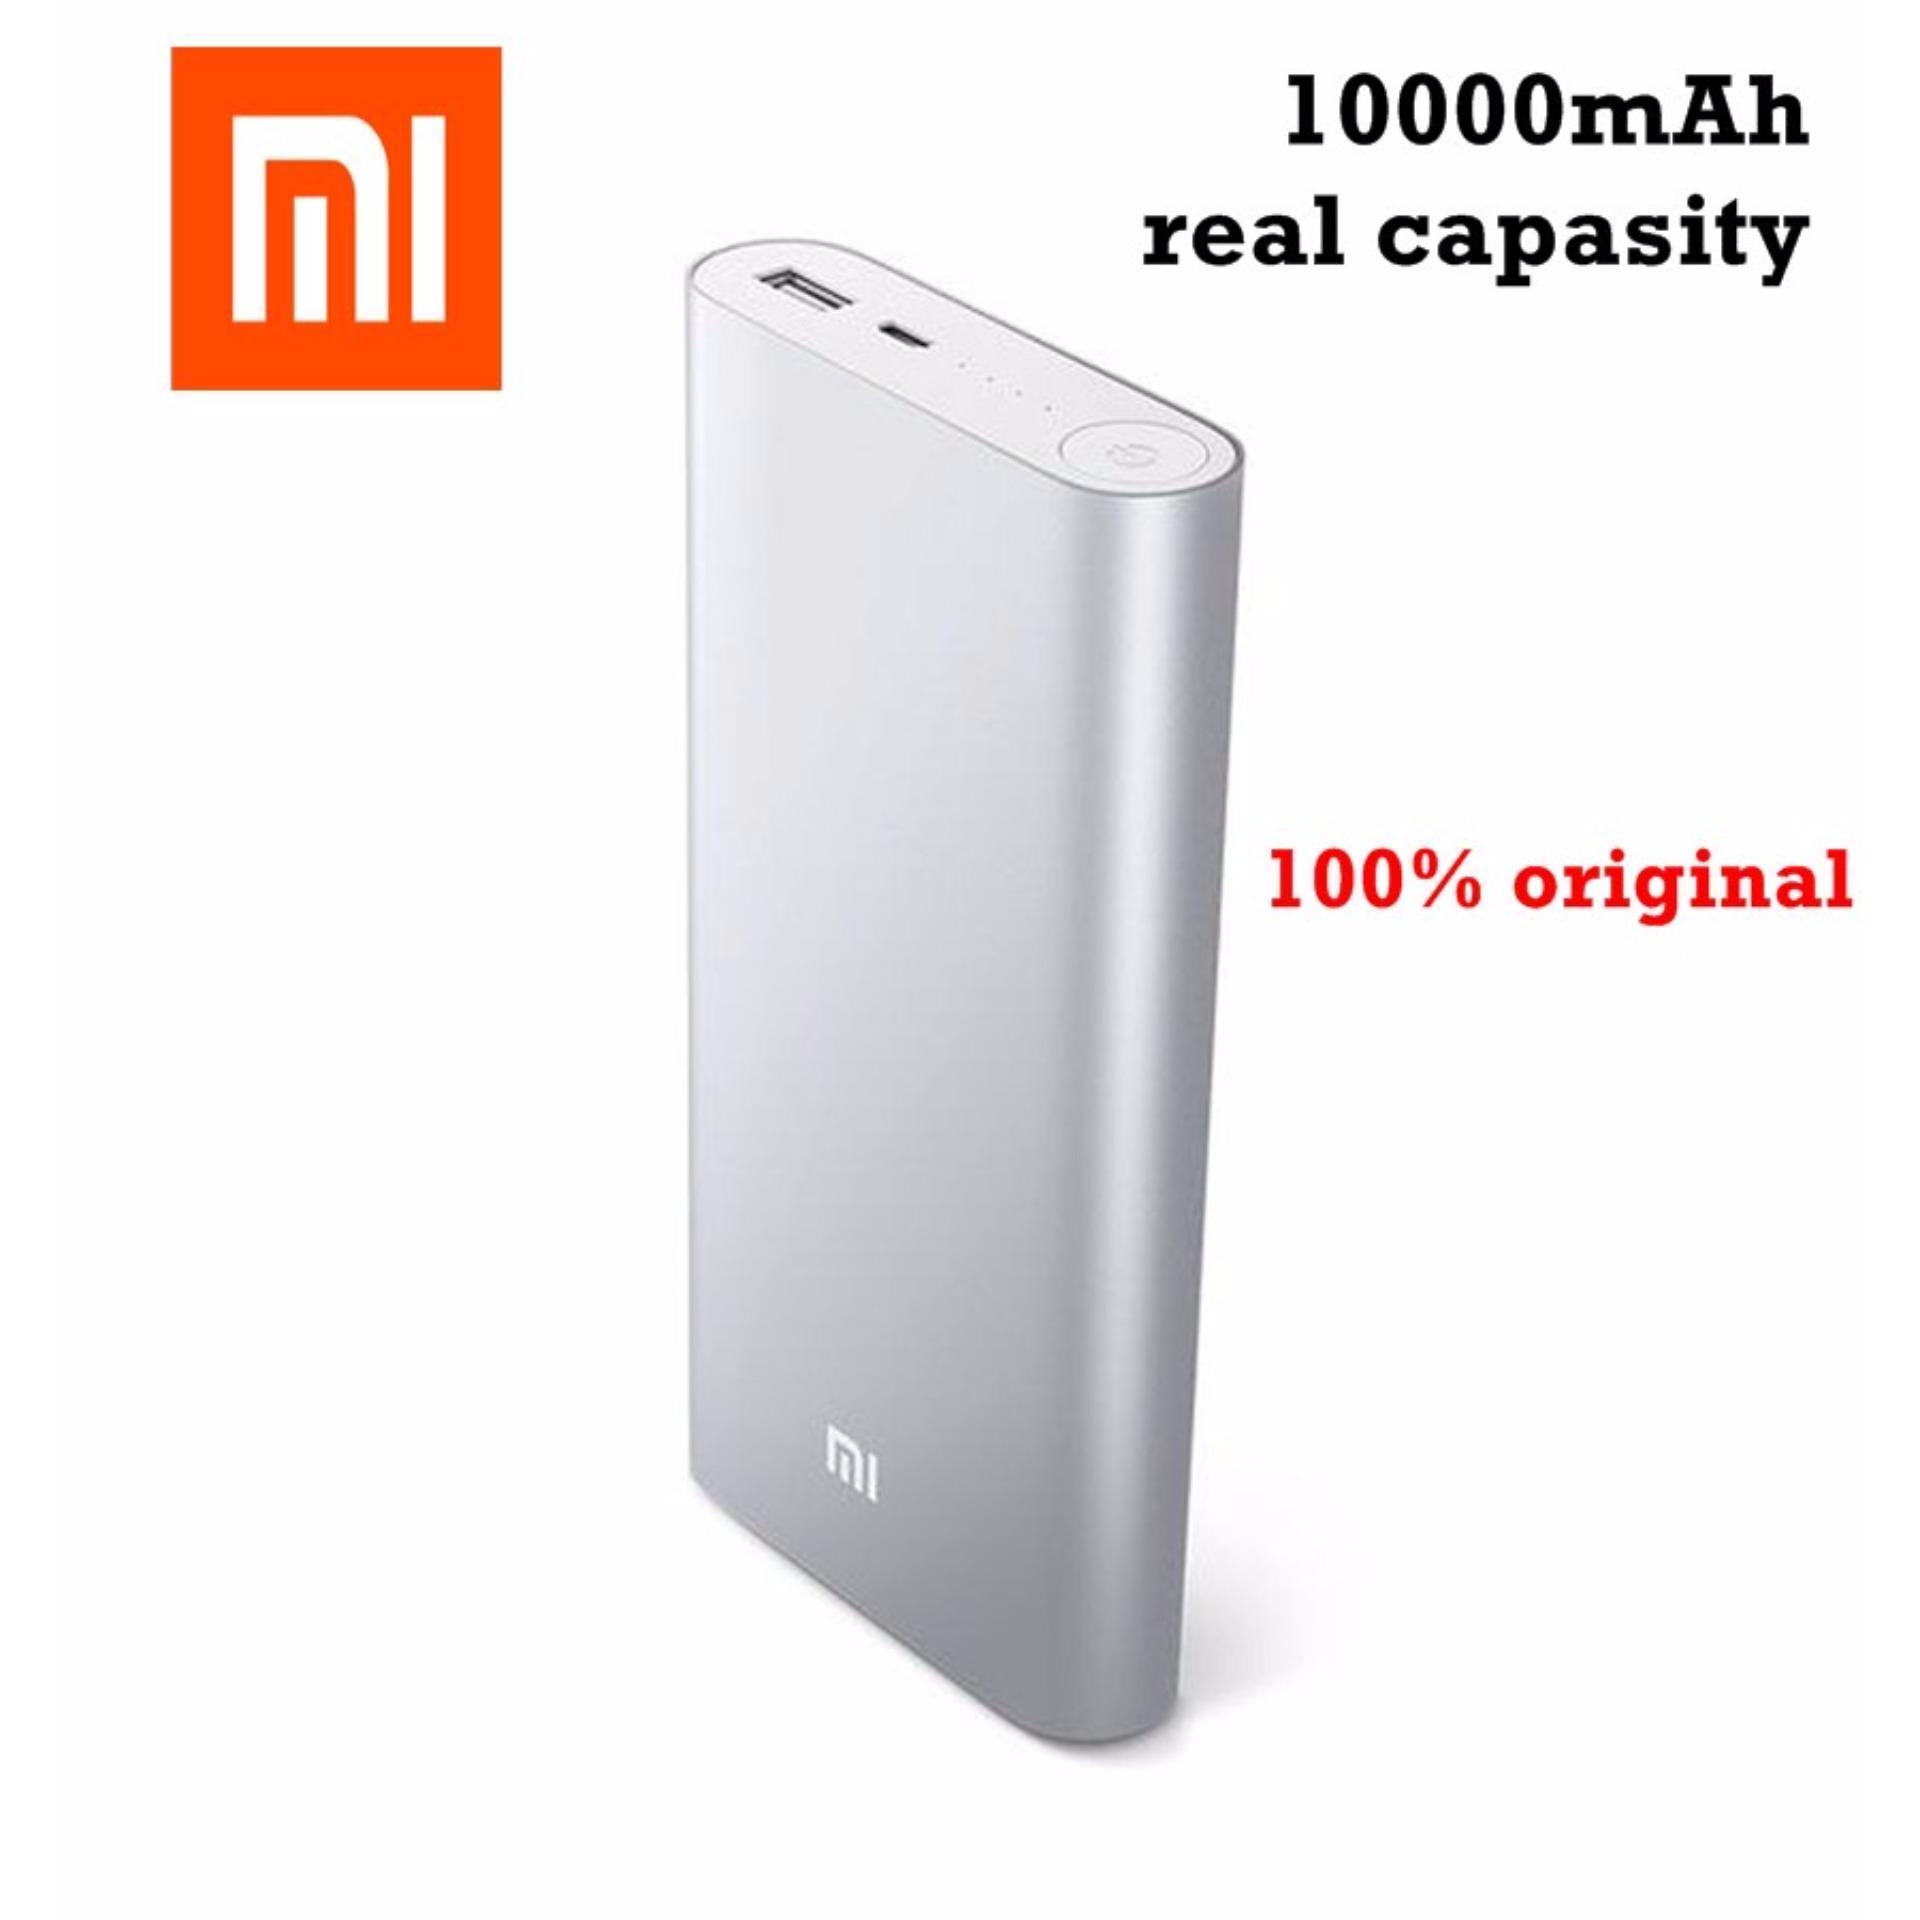 Pusat Jual Beli Xiaomi Mi Power Bank 2 10000Mah Original Powerbank Silver 1 Tahun Garansi Dki Jakarta